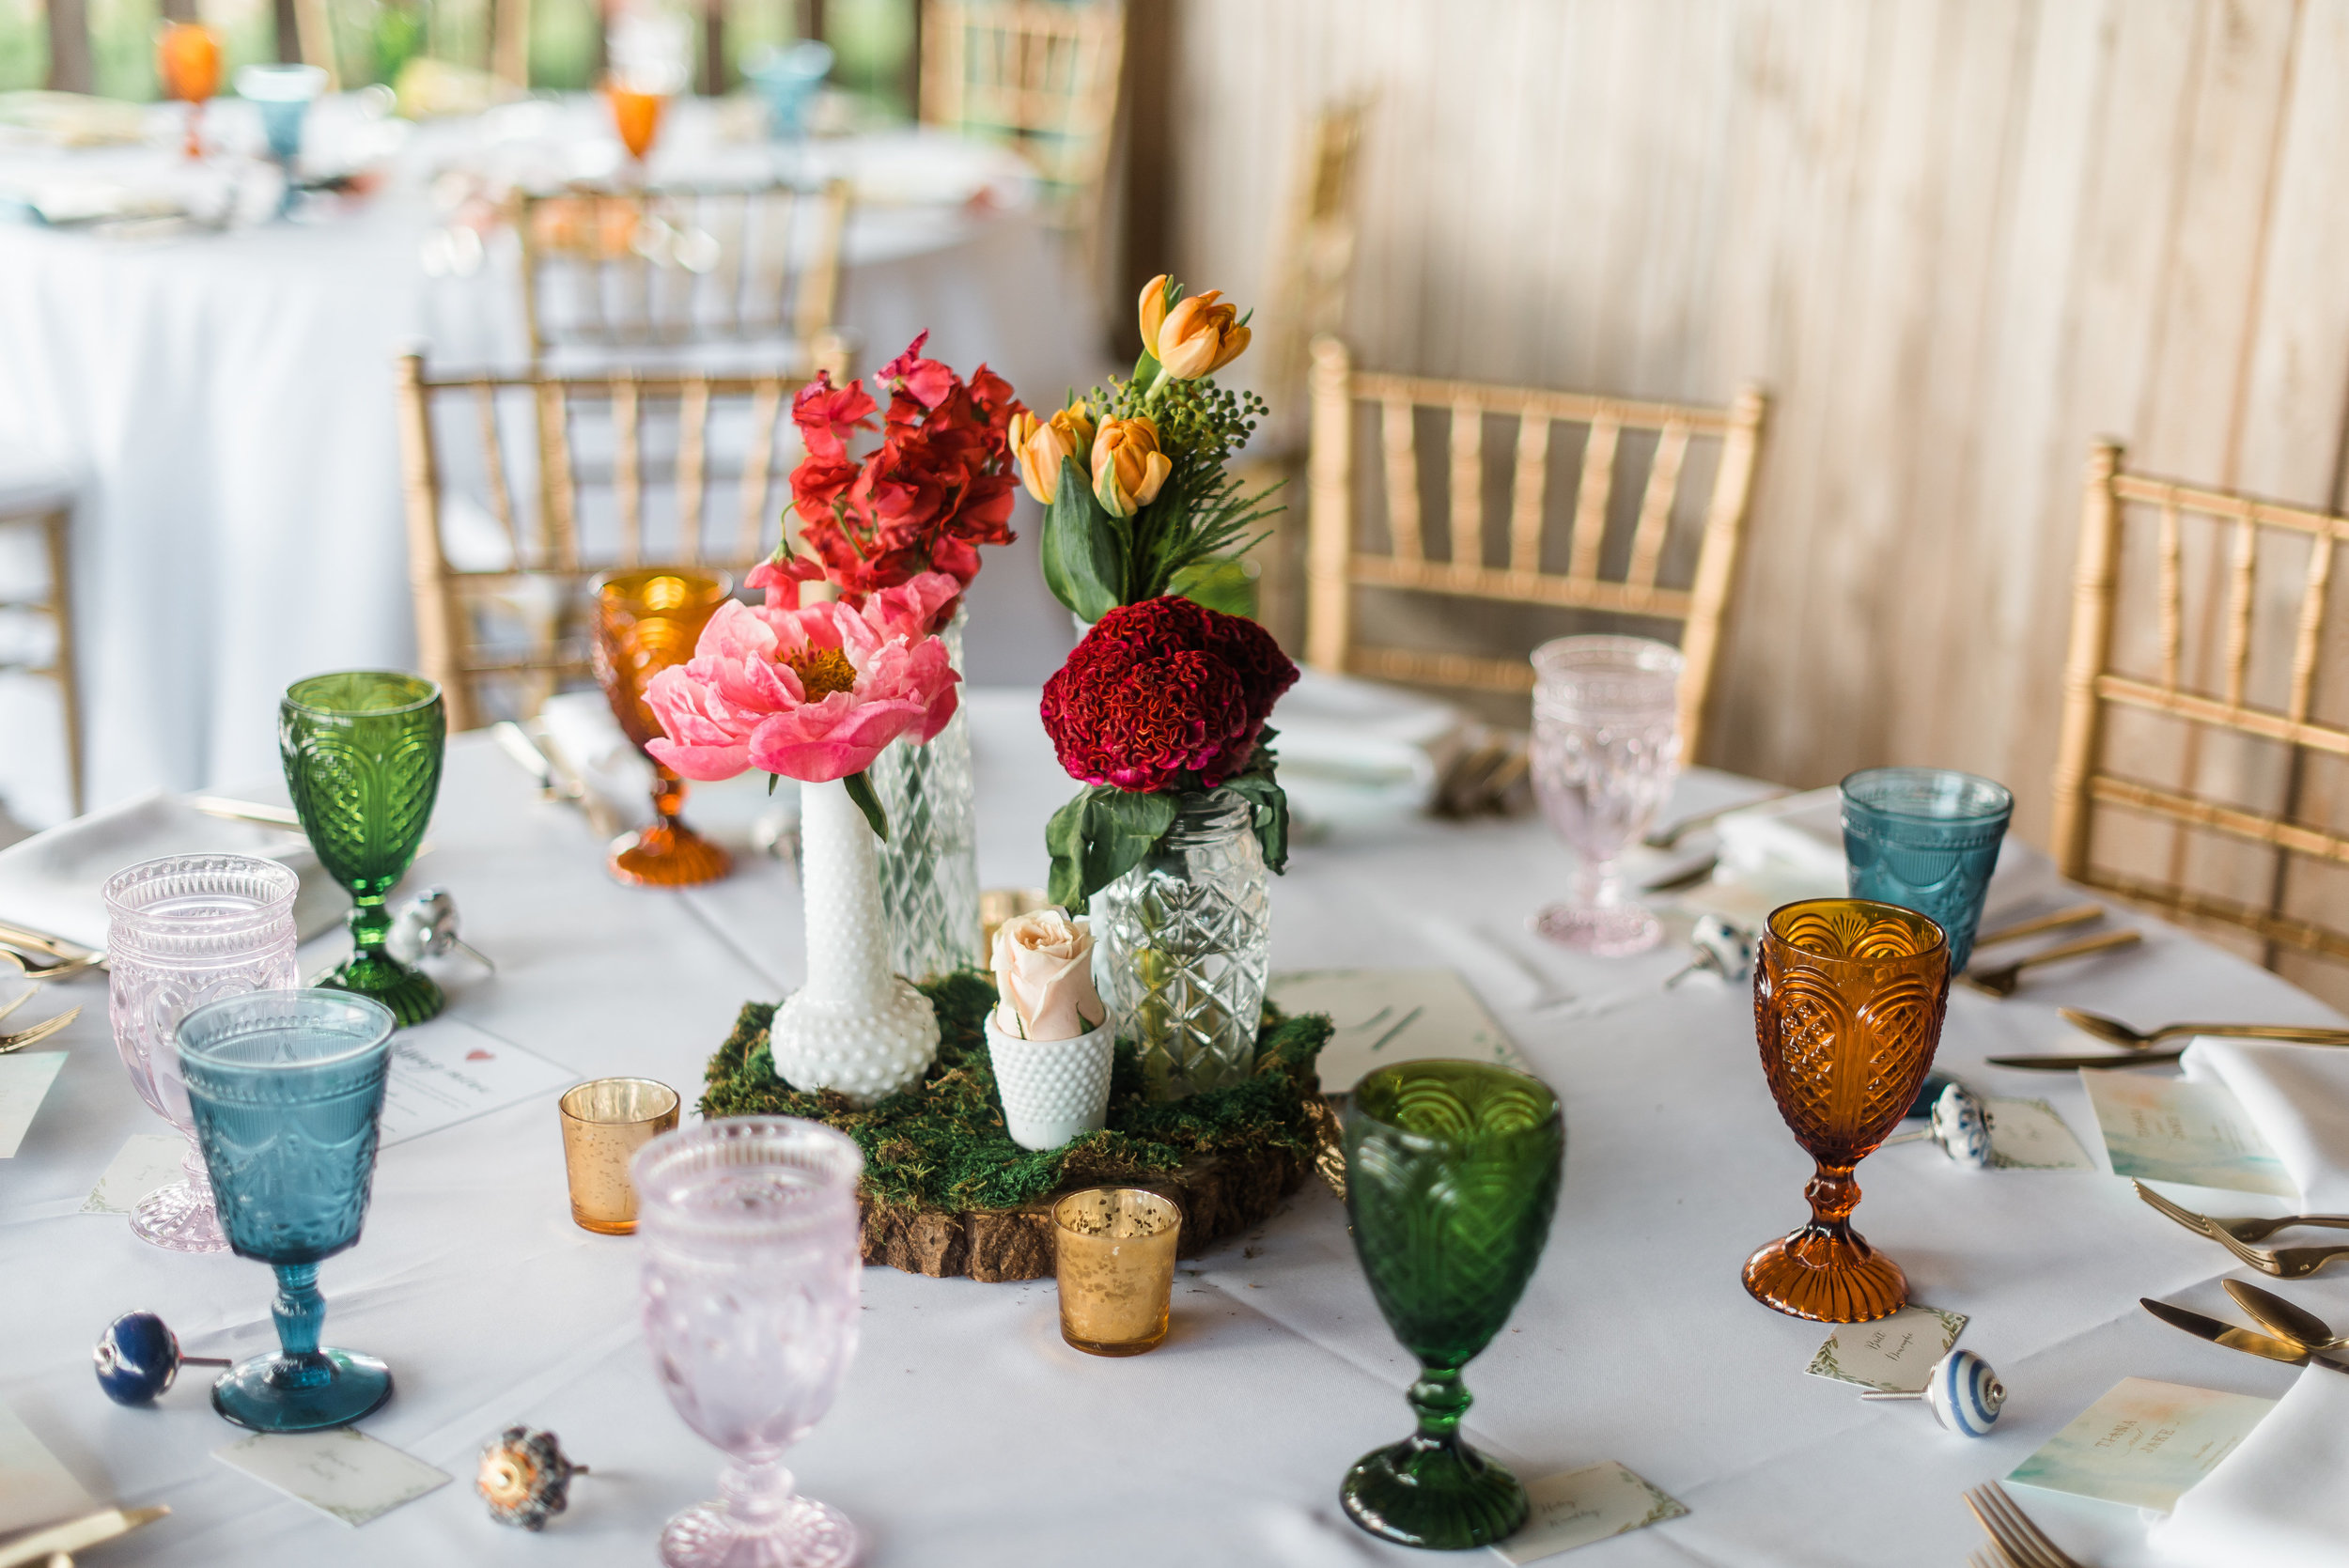 pittsburgh-wedding-photographer-rustic-acres-farm-summer-boho-wedding0017.jpg